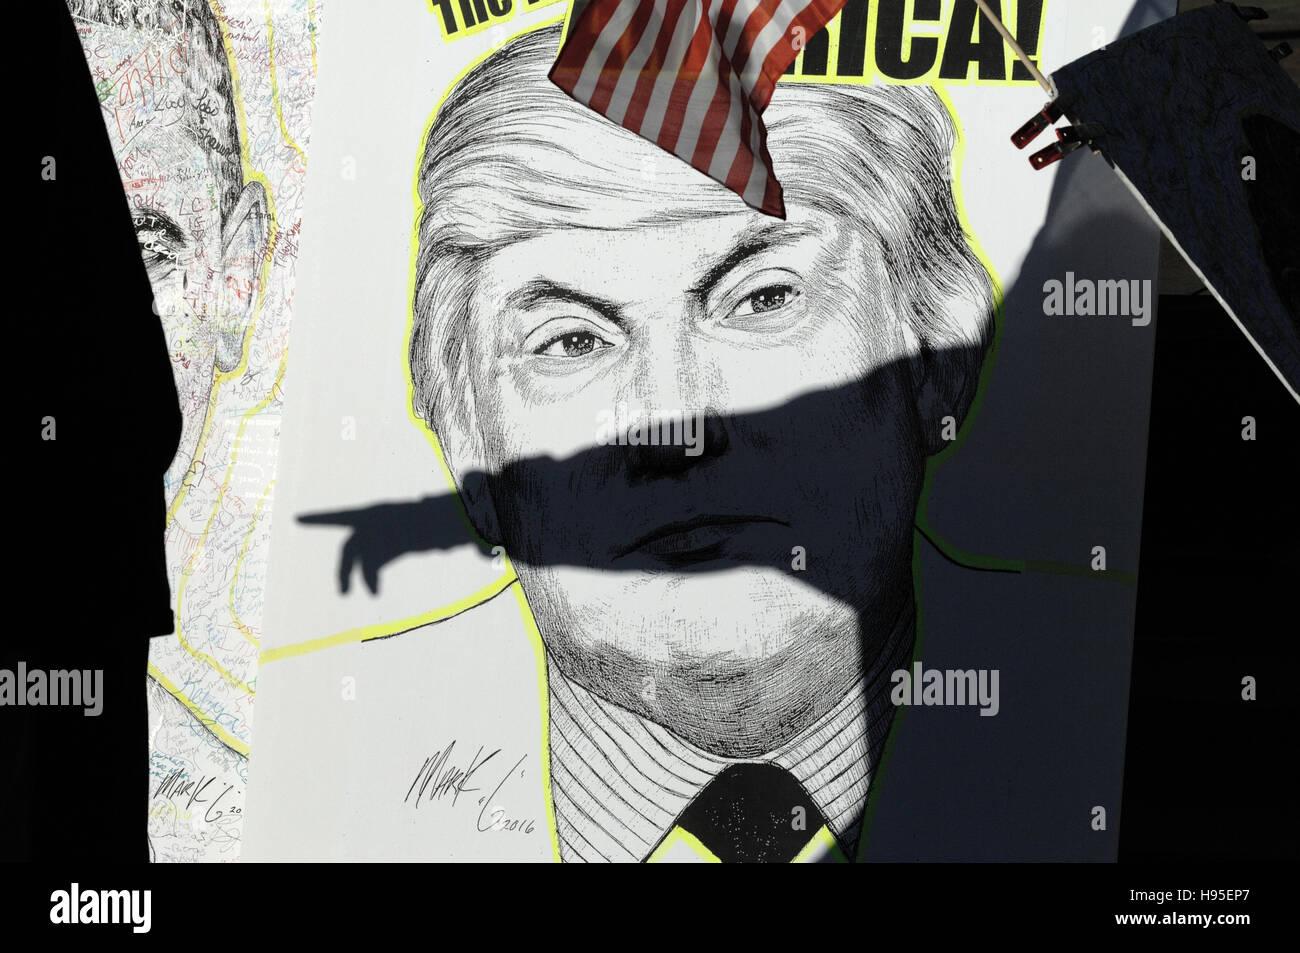 Philadelphia, Pennsylvania, USA. 19th November, 2016. Artist Mark G displays artworks he produced of Barack Obama, - Stock Image